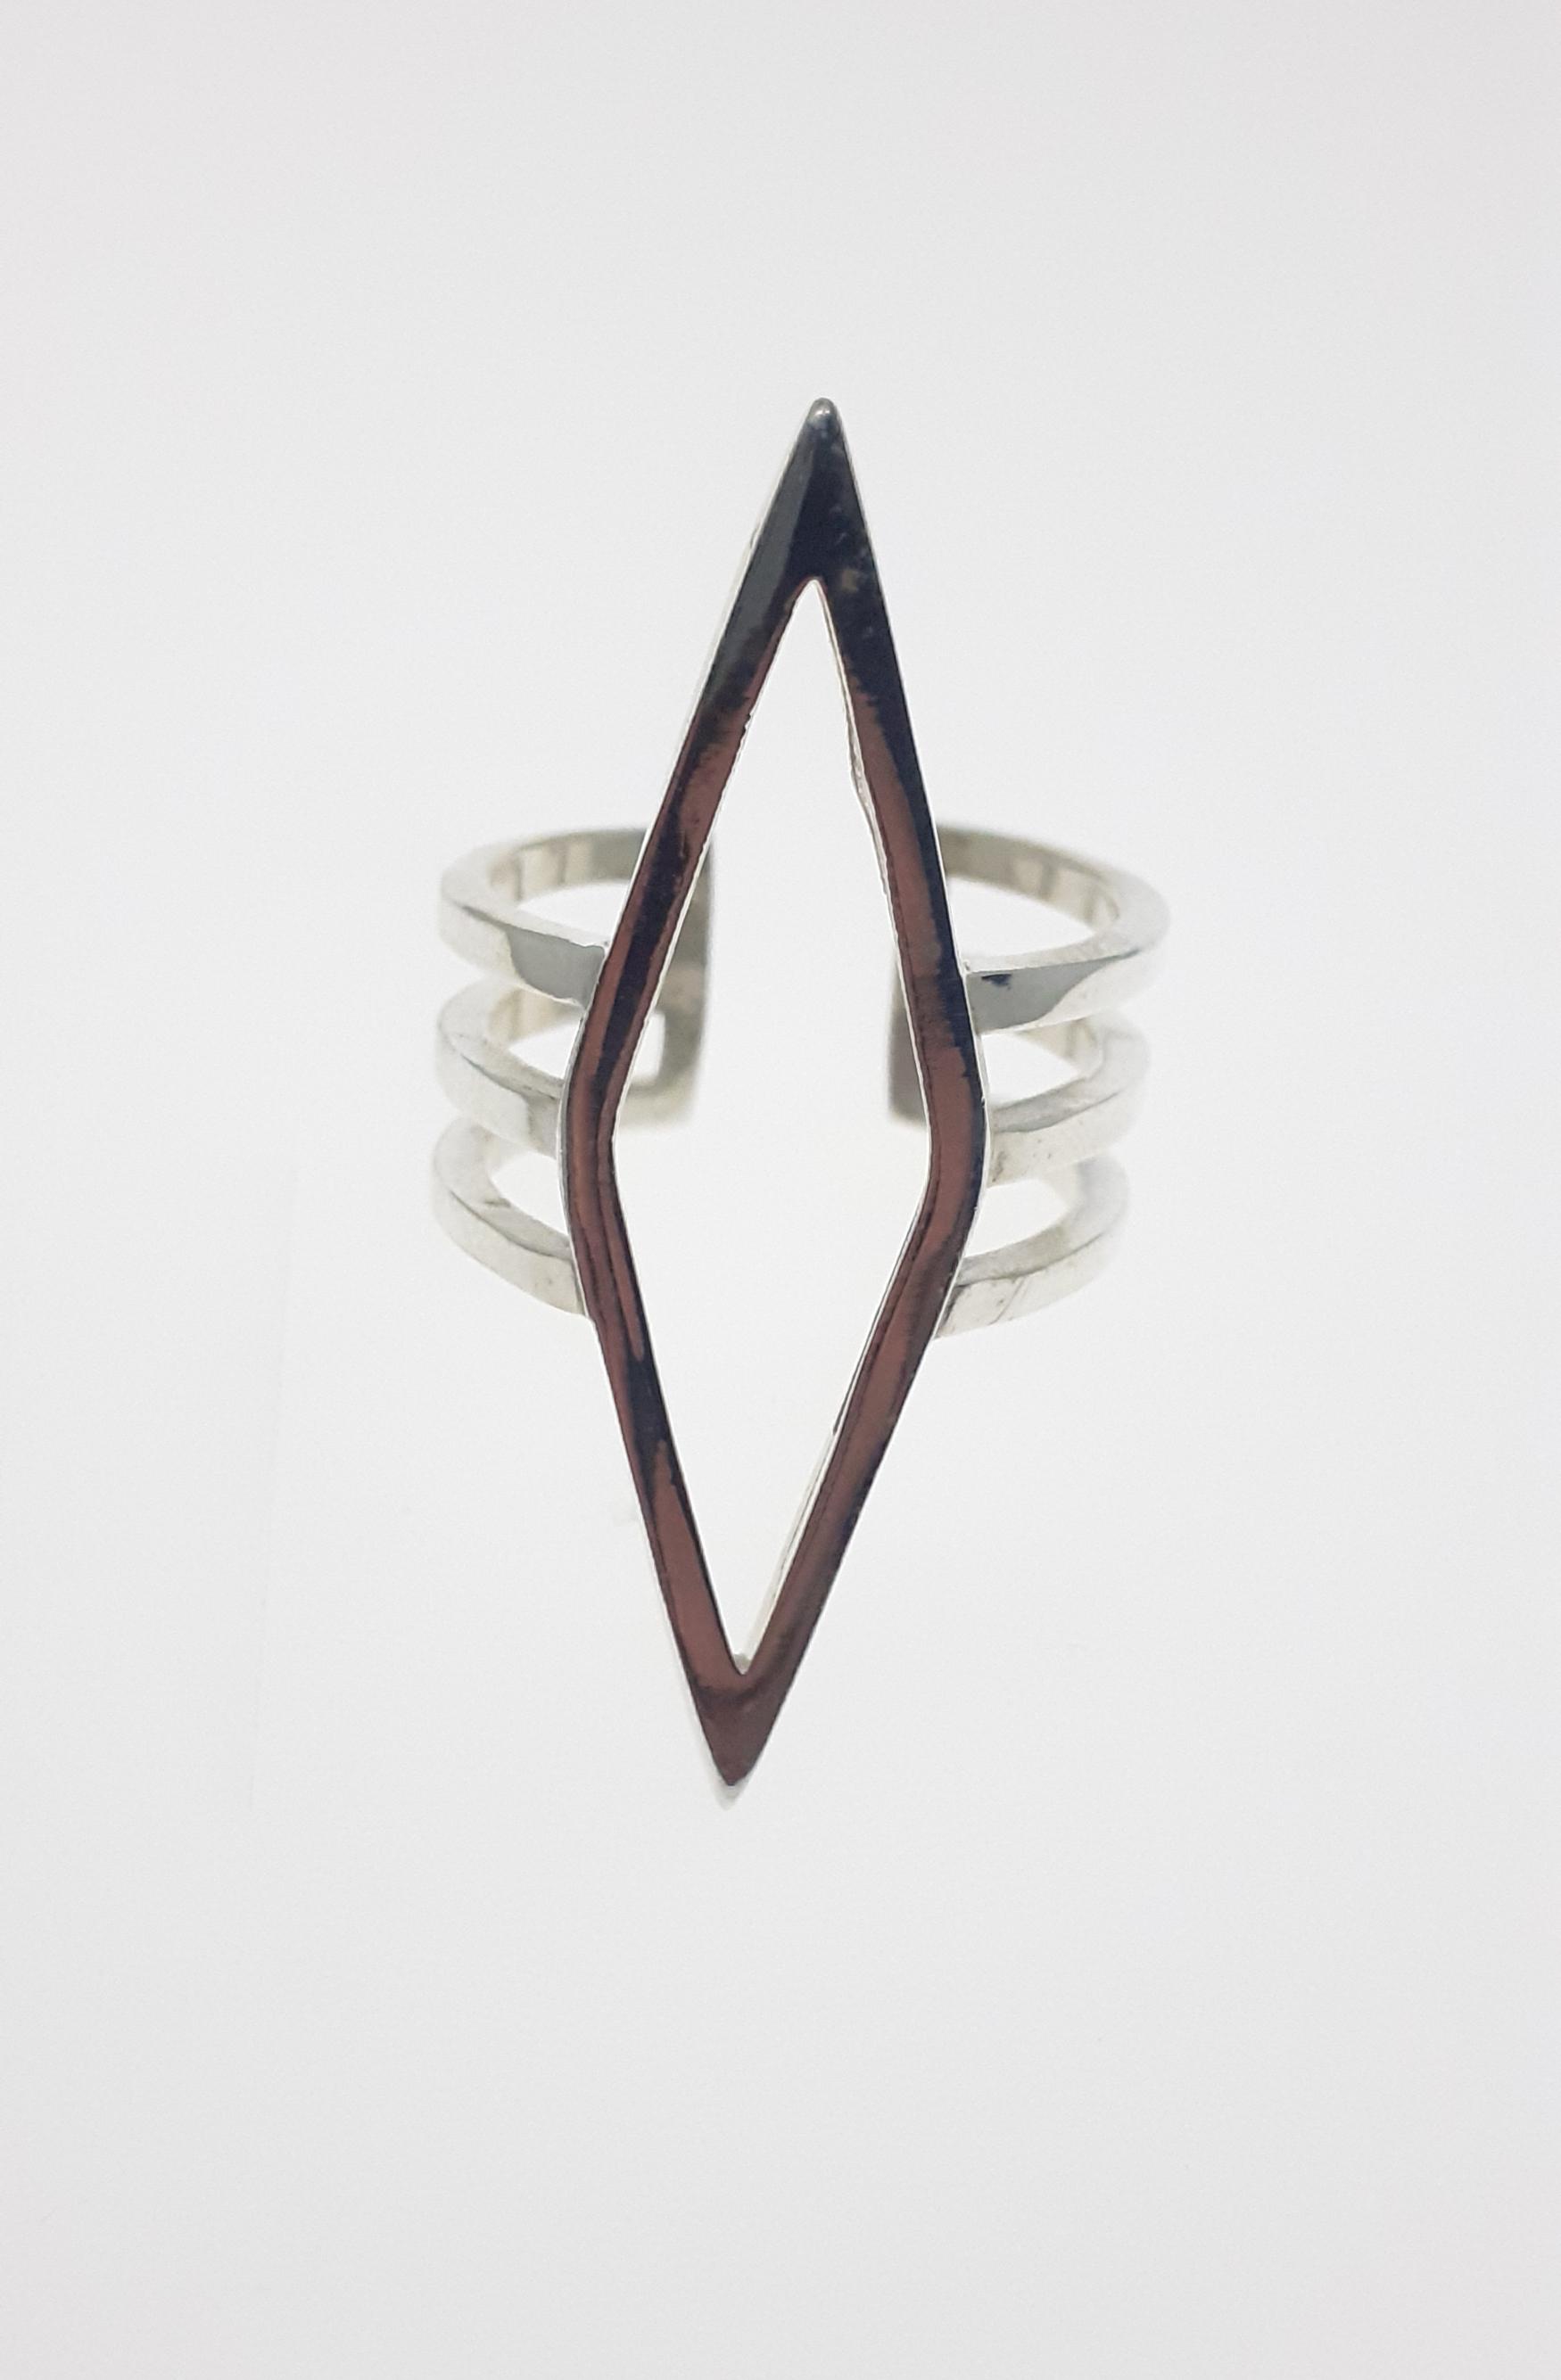 Sensi joyas jewellery Granada silver engagementSILVER RING